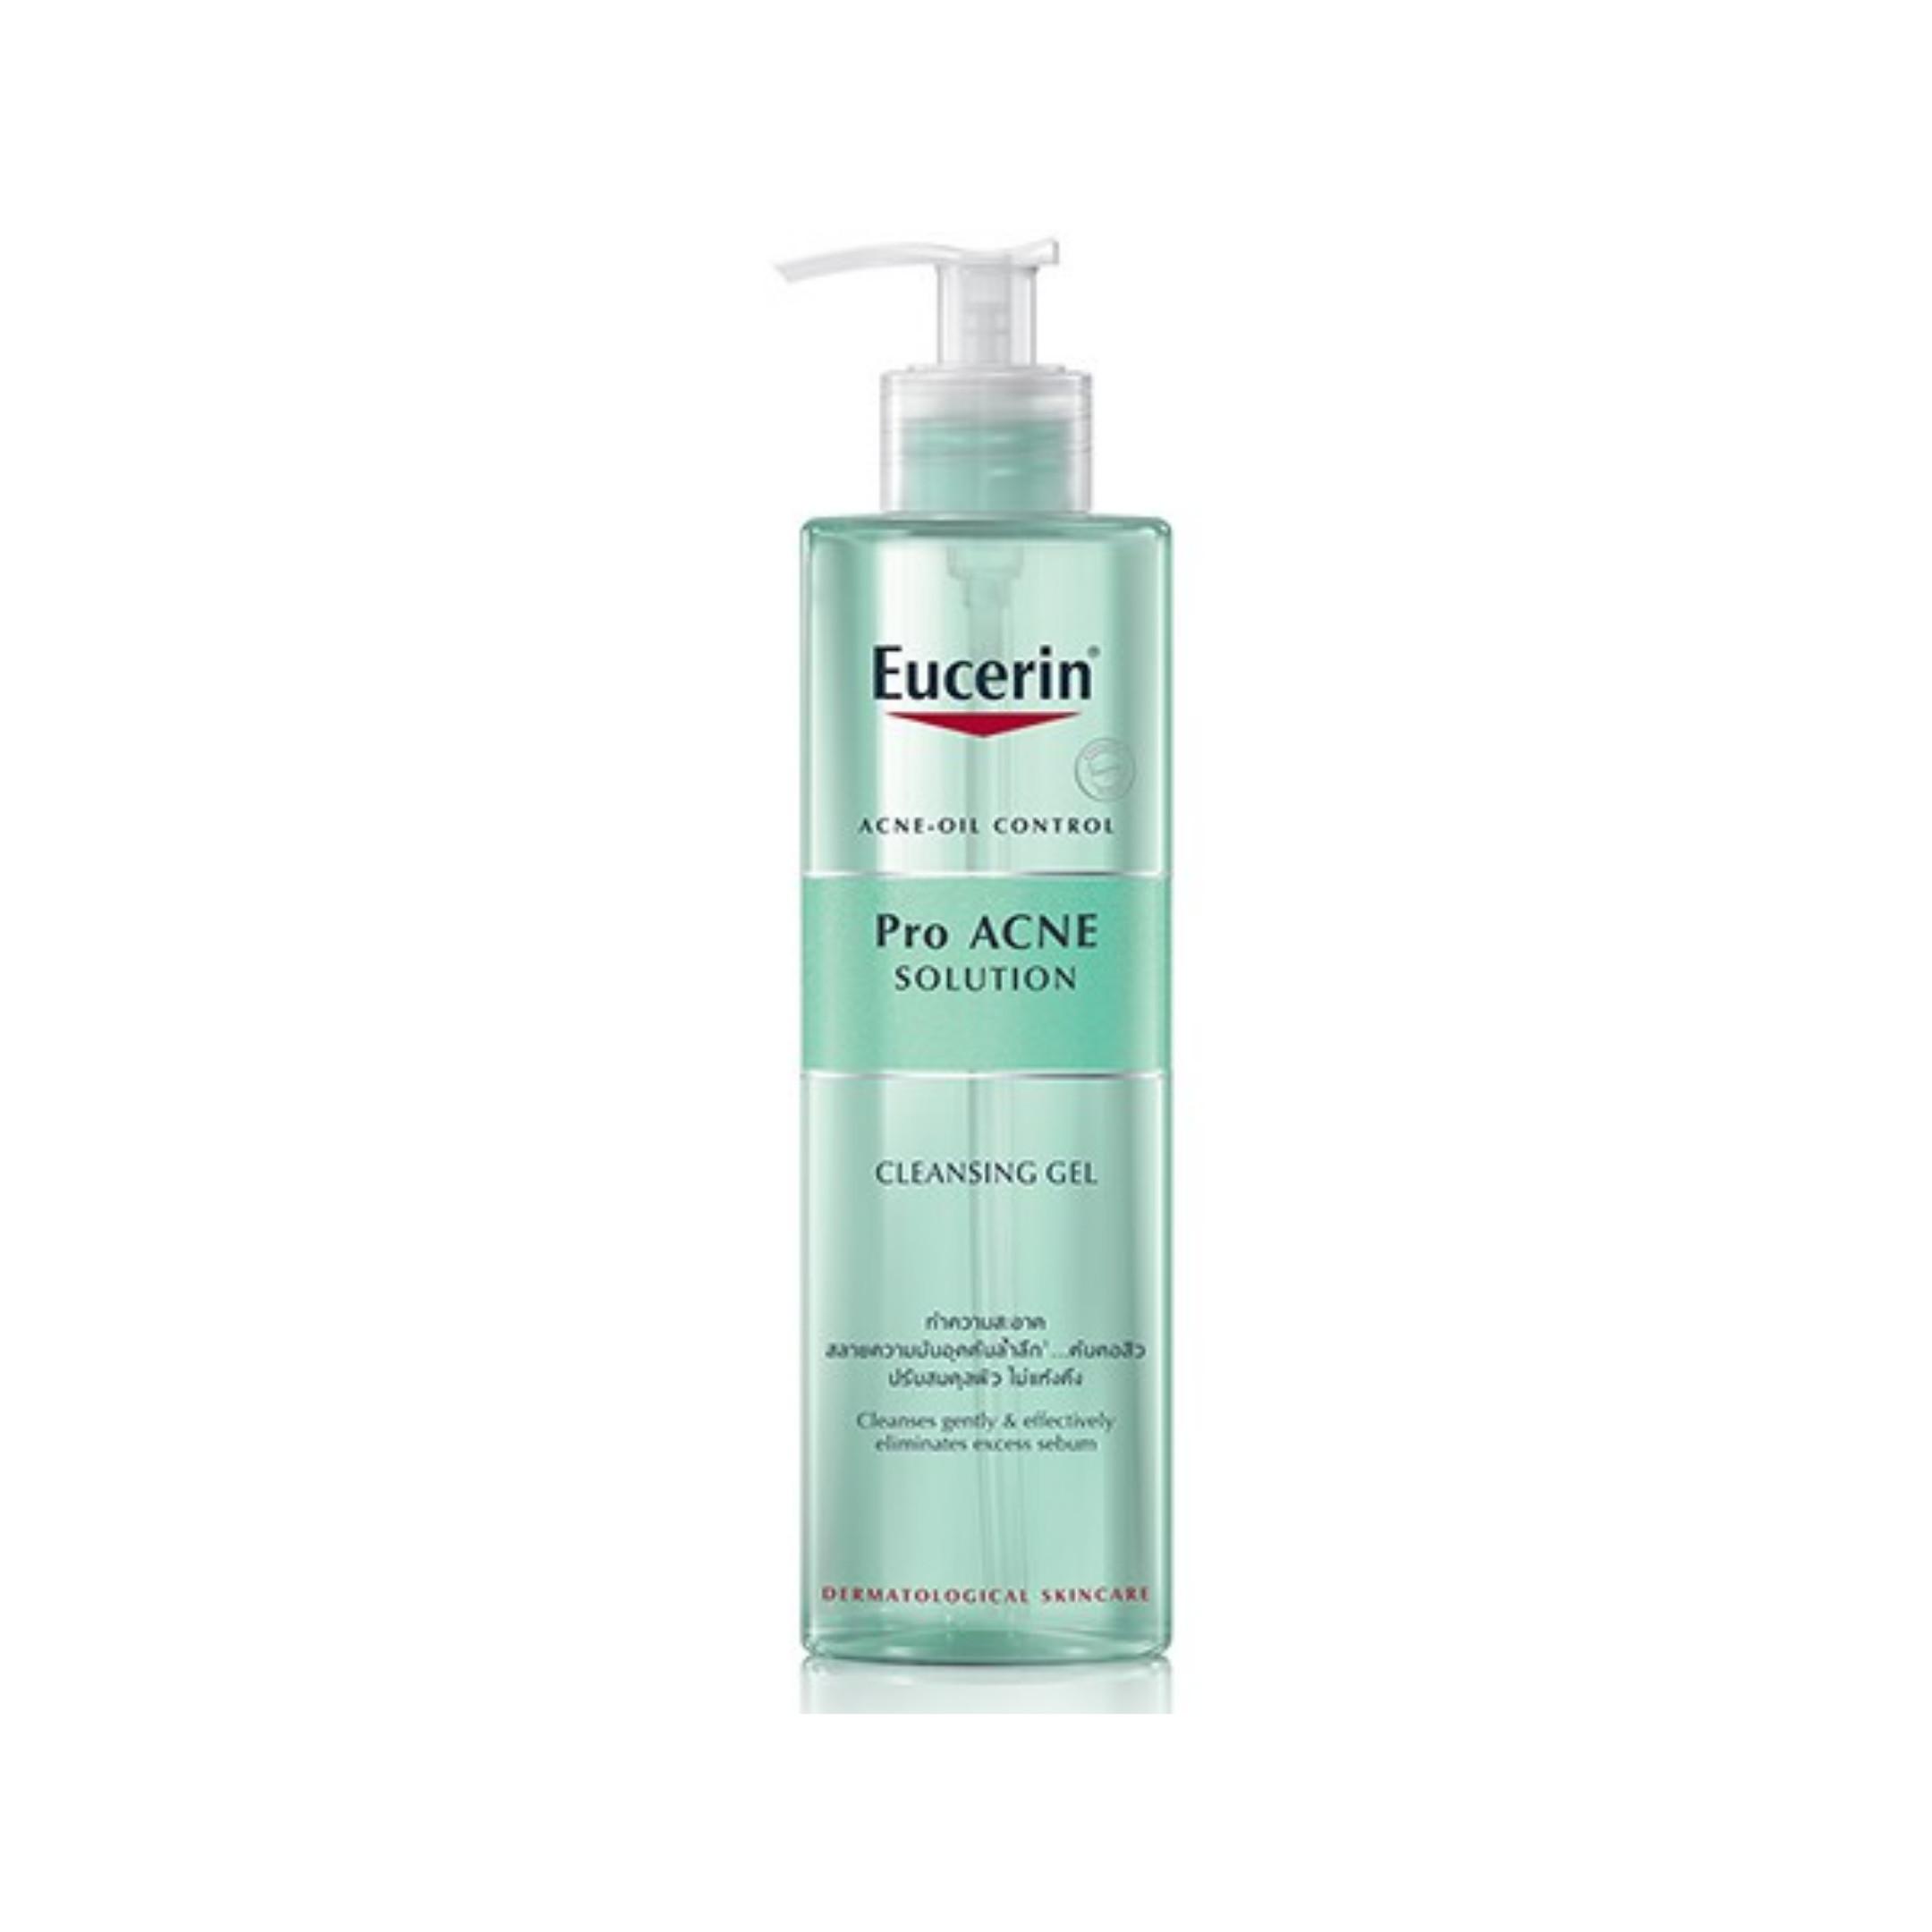 Gel rửa mặt giảm mụn loại bỏ nhờn Eucerin Pro Acne Solution Cleansing Gel (Nhập khẩu)